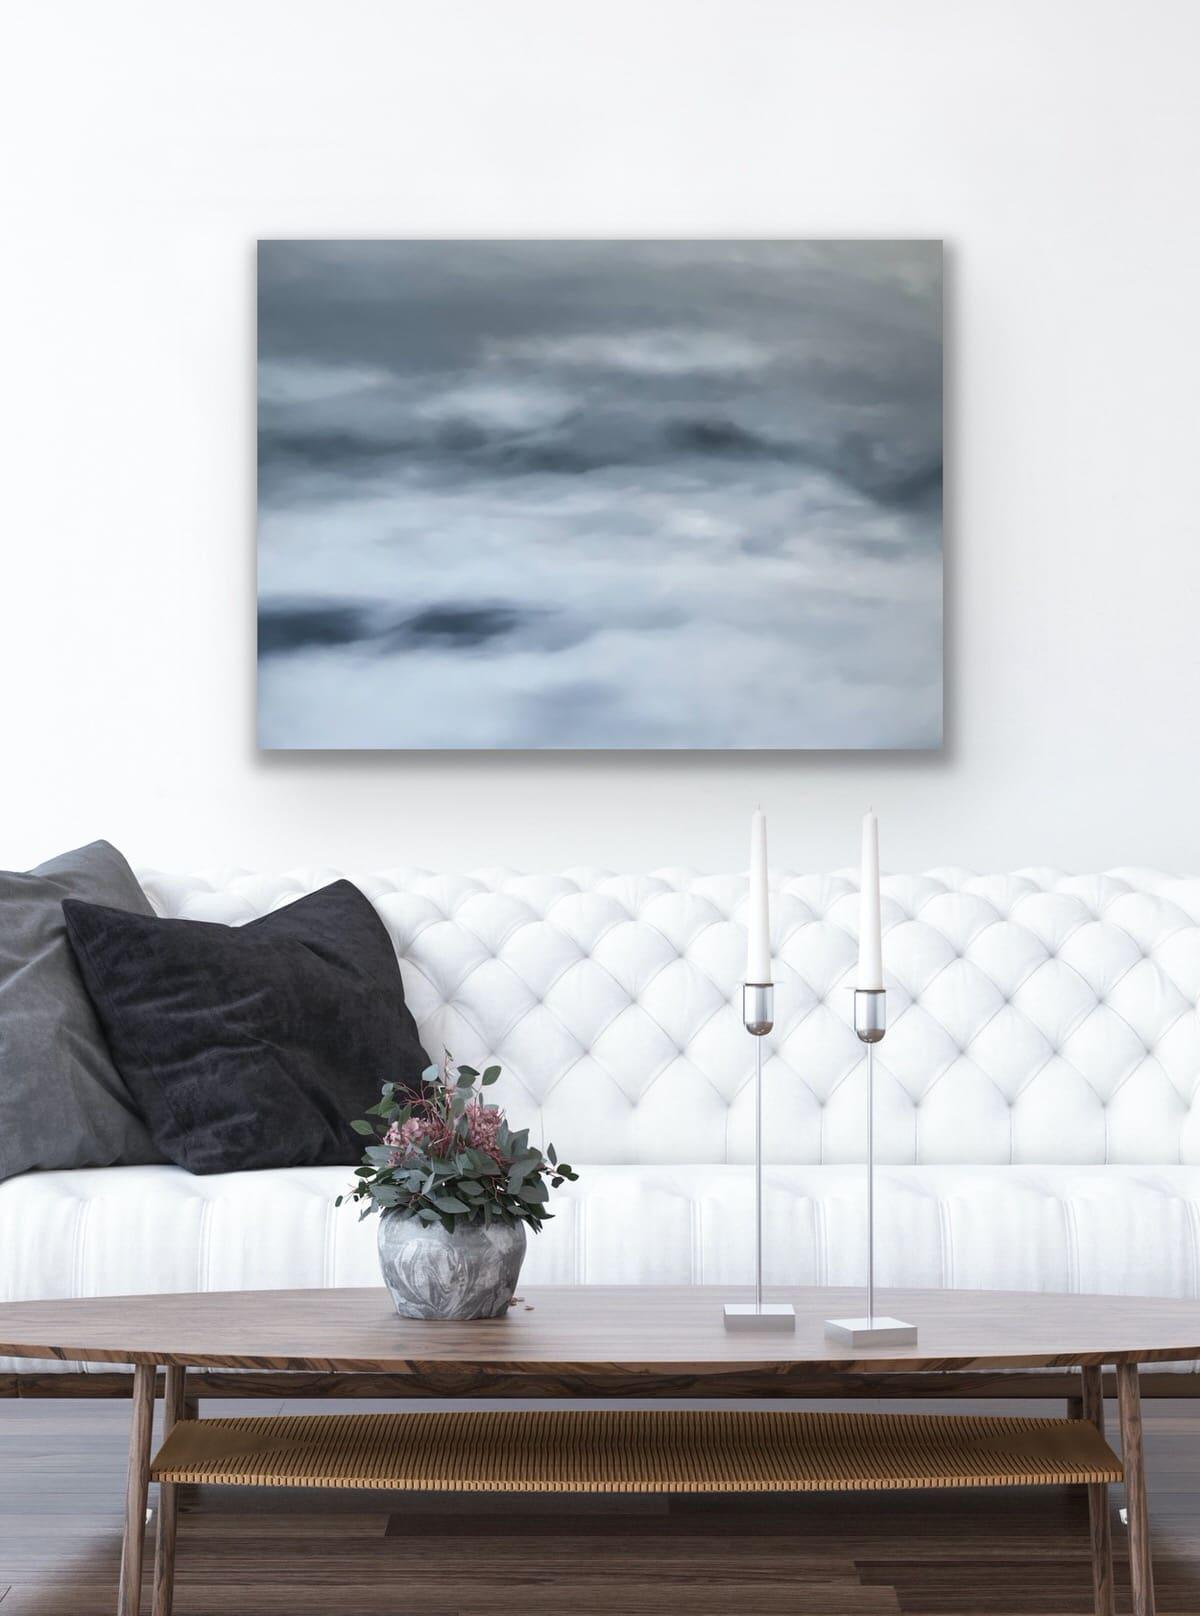 Unique-oil-painting-wall-decor-by-Studio-L-emerging-artist-Laura-Schneider-_5971